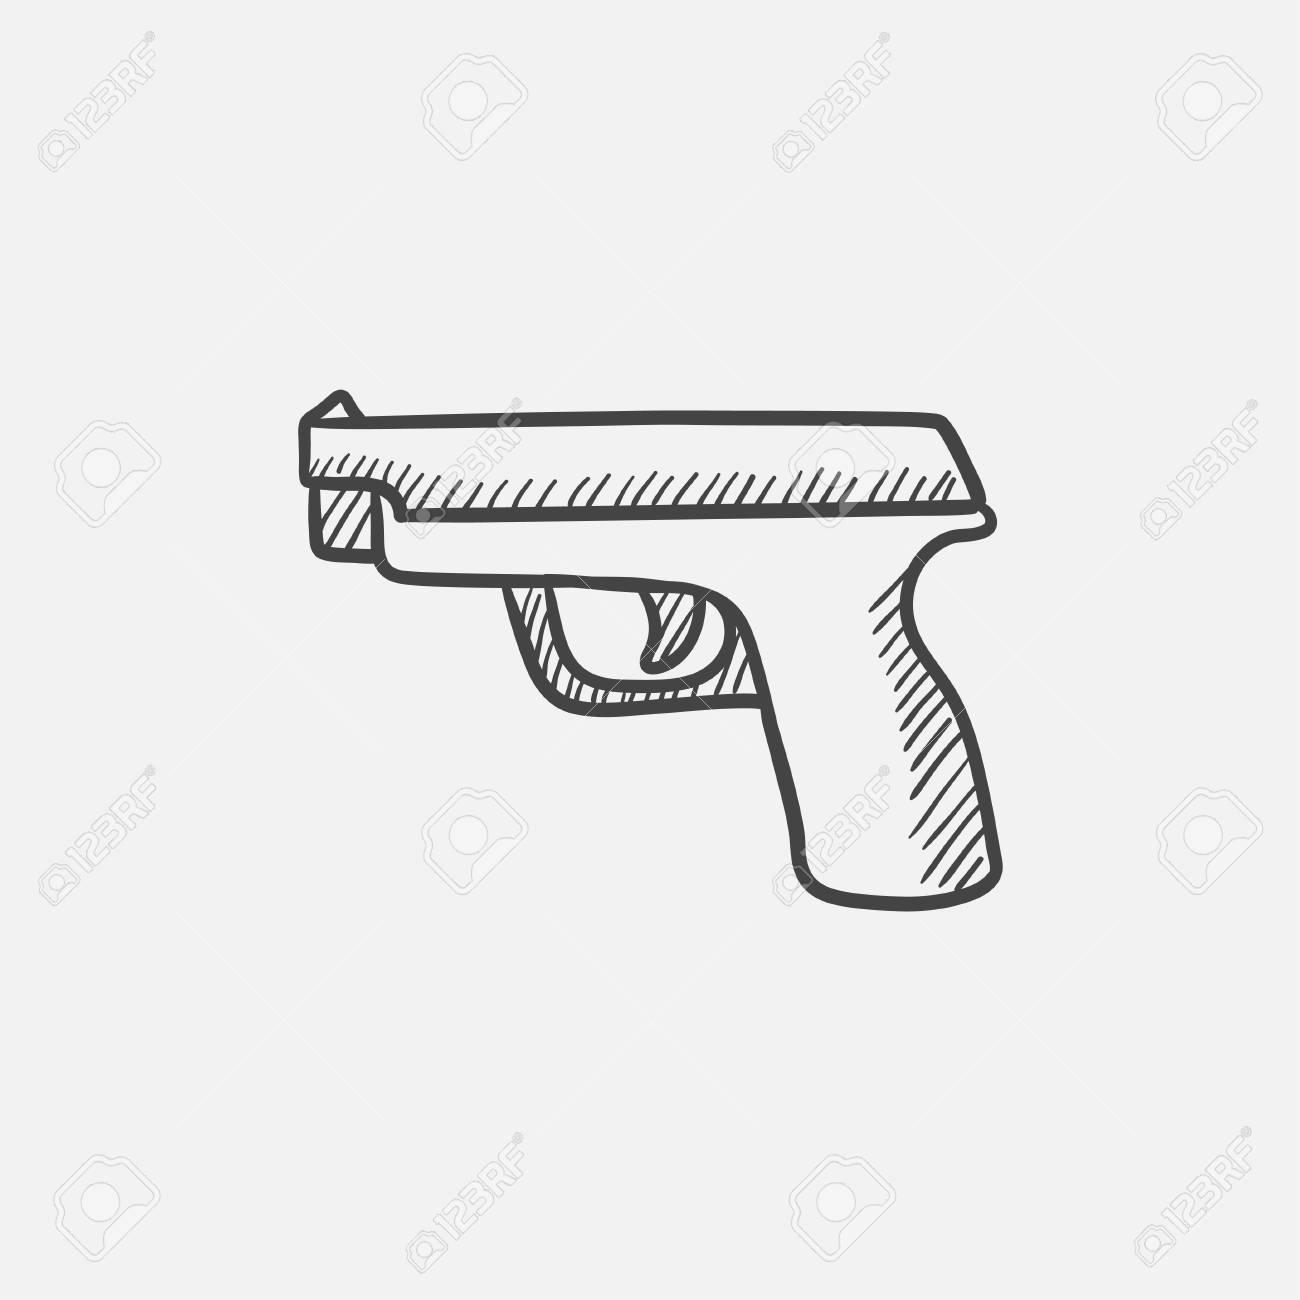 icono de esbozo de pistola para web móvil e infografía mano dibuja